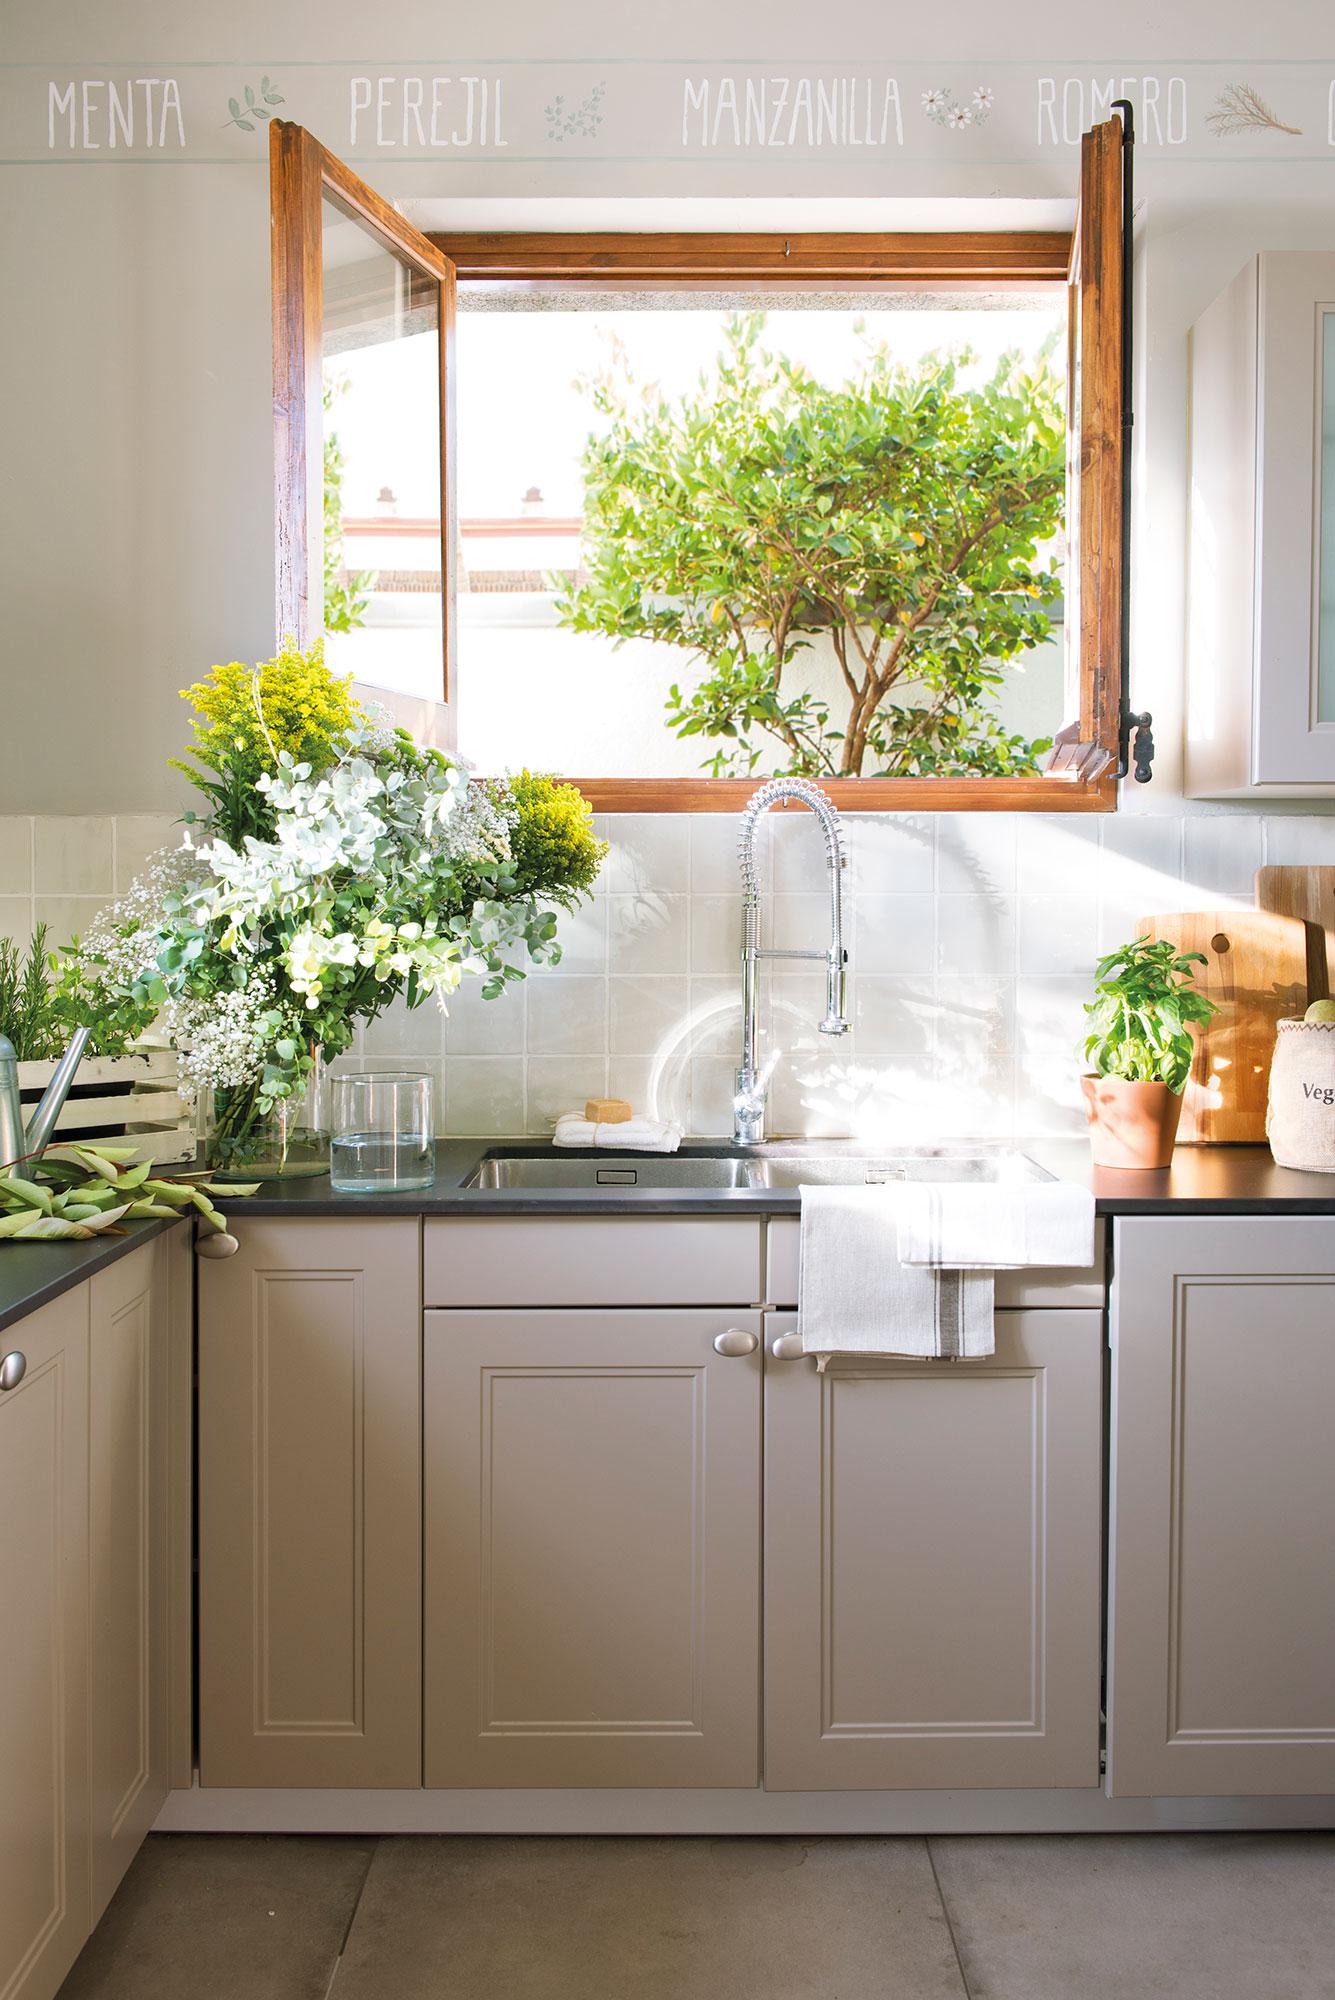 Como hacer un fregadero de obra great semitoma de cocina - Fregadero cocina ...